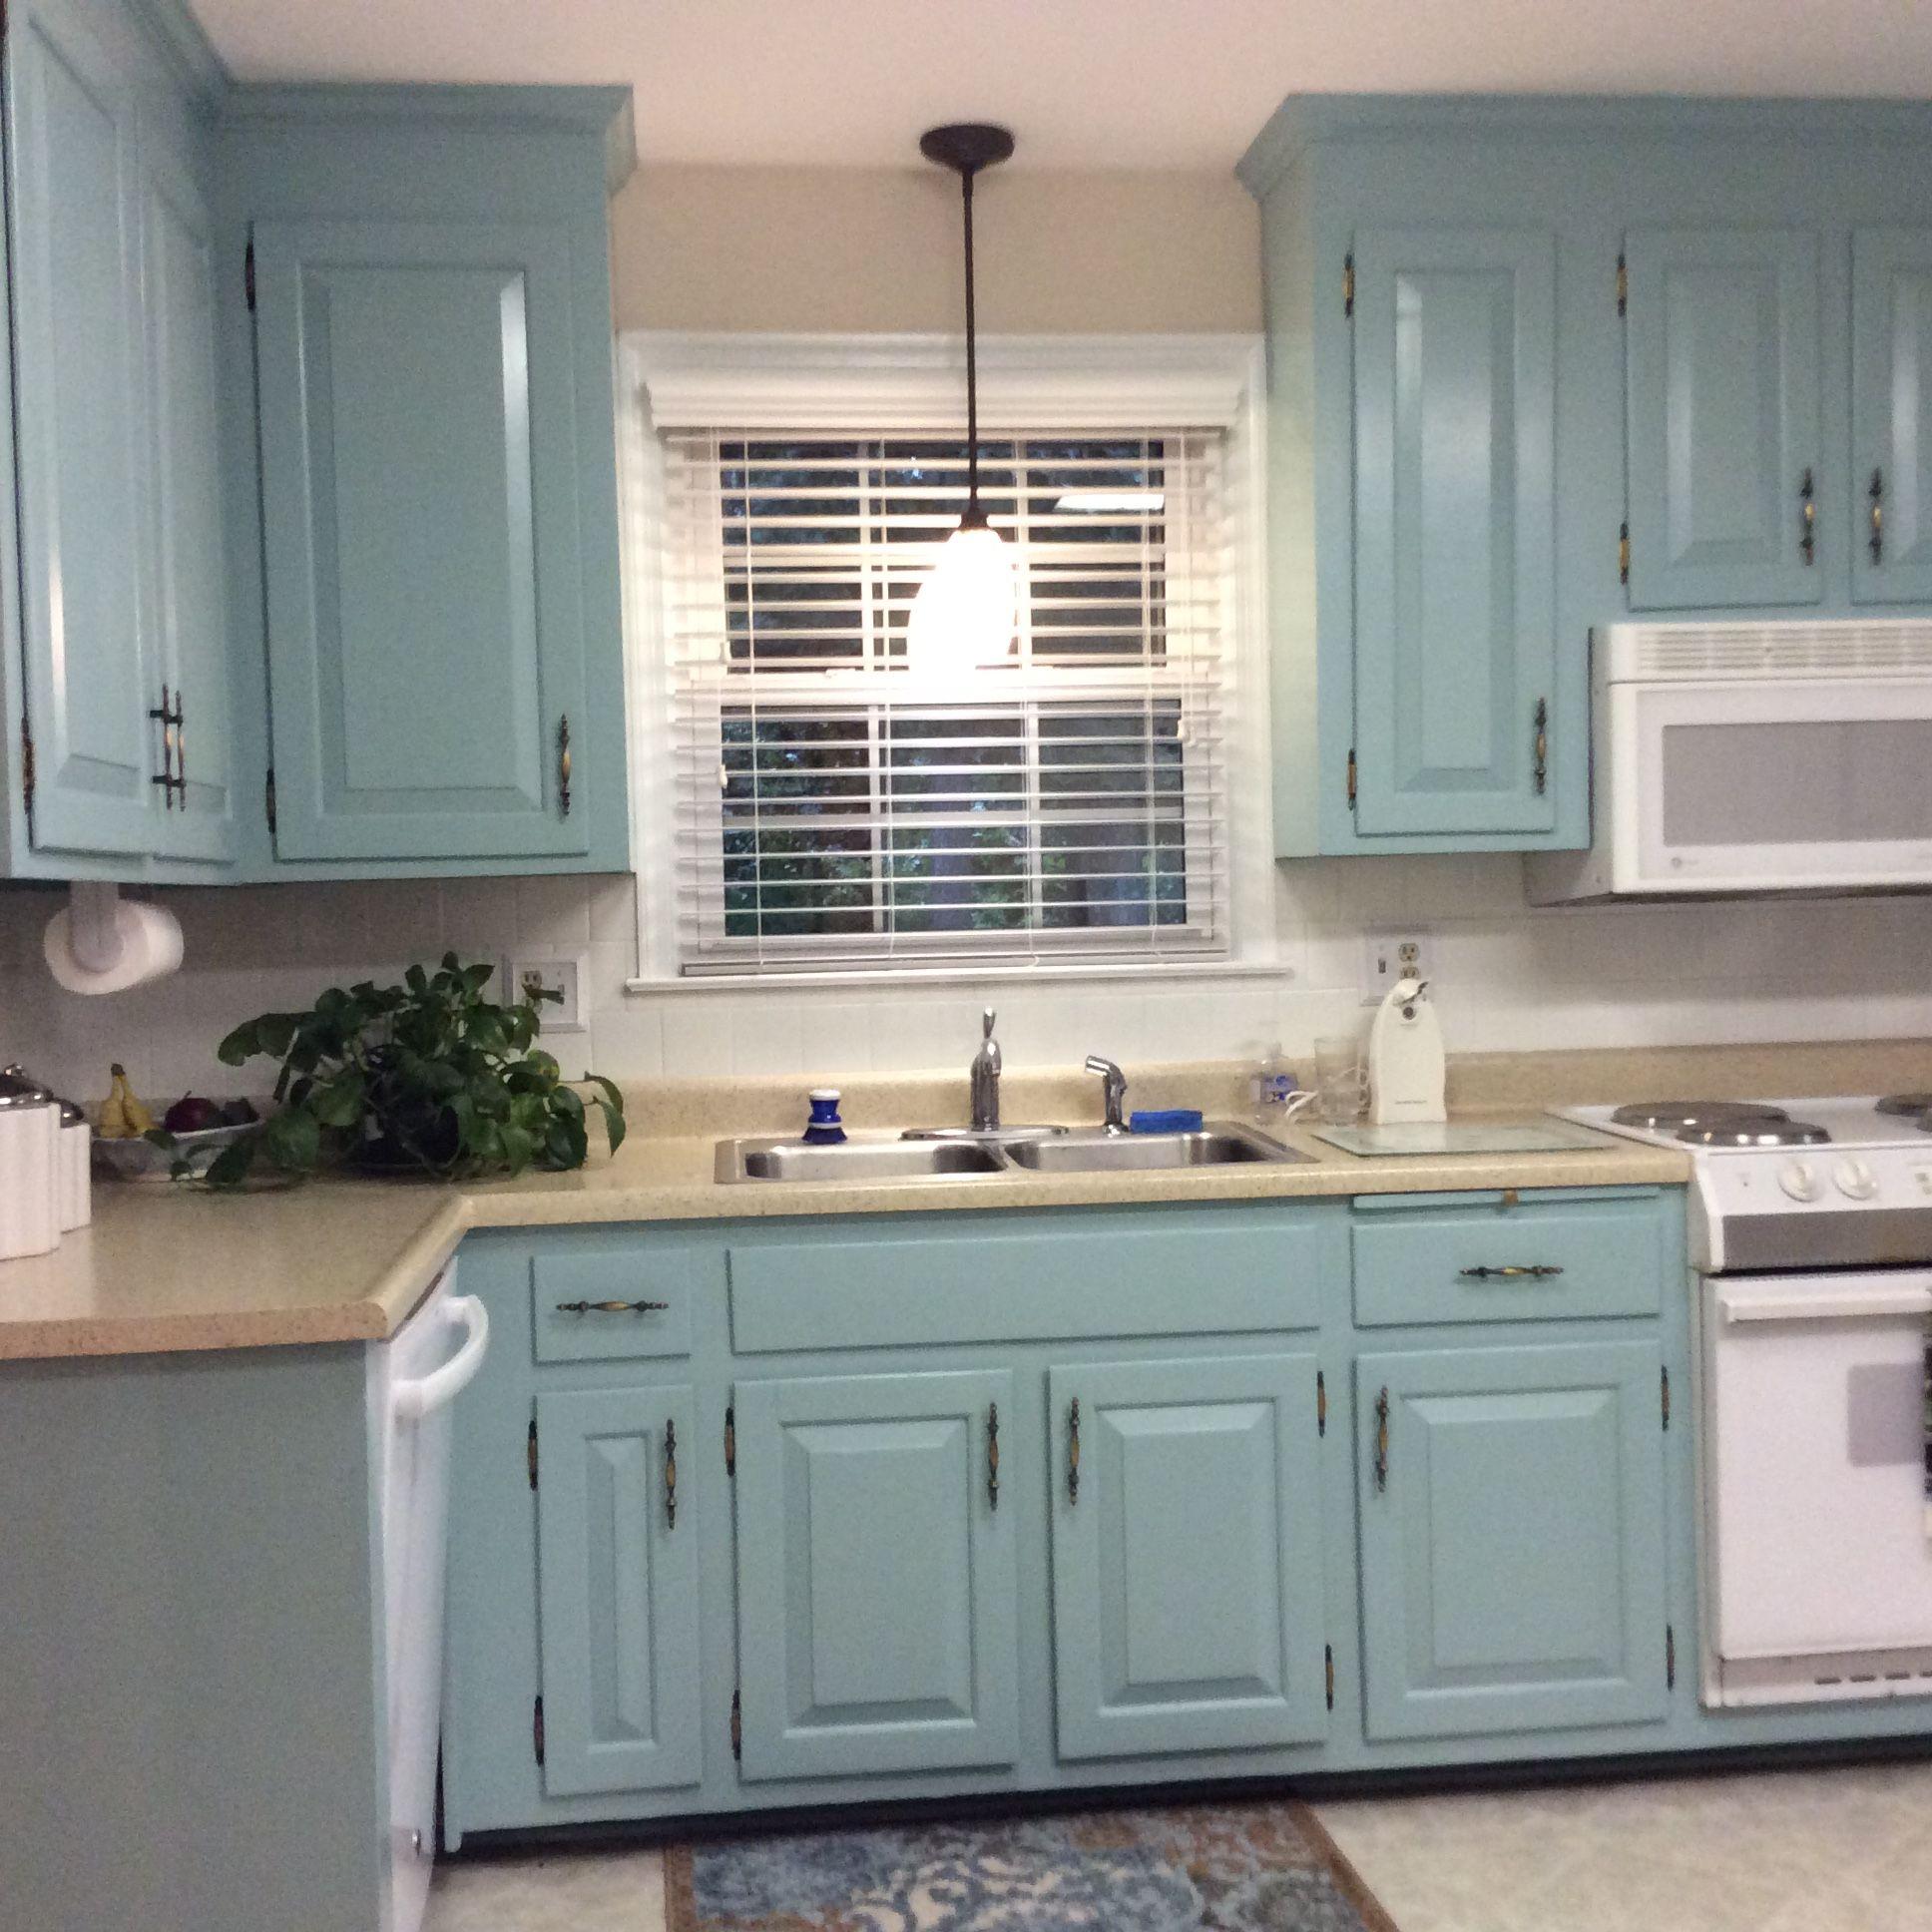 Aqua painted kitchen cabinets | Before and After | Pinterest | Aqua ...